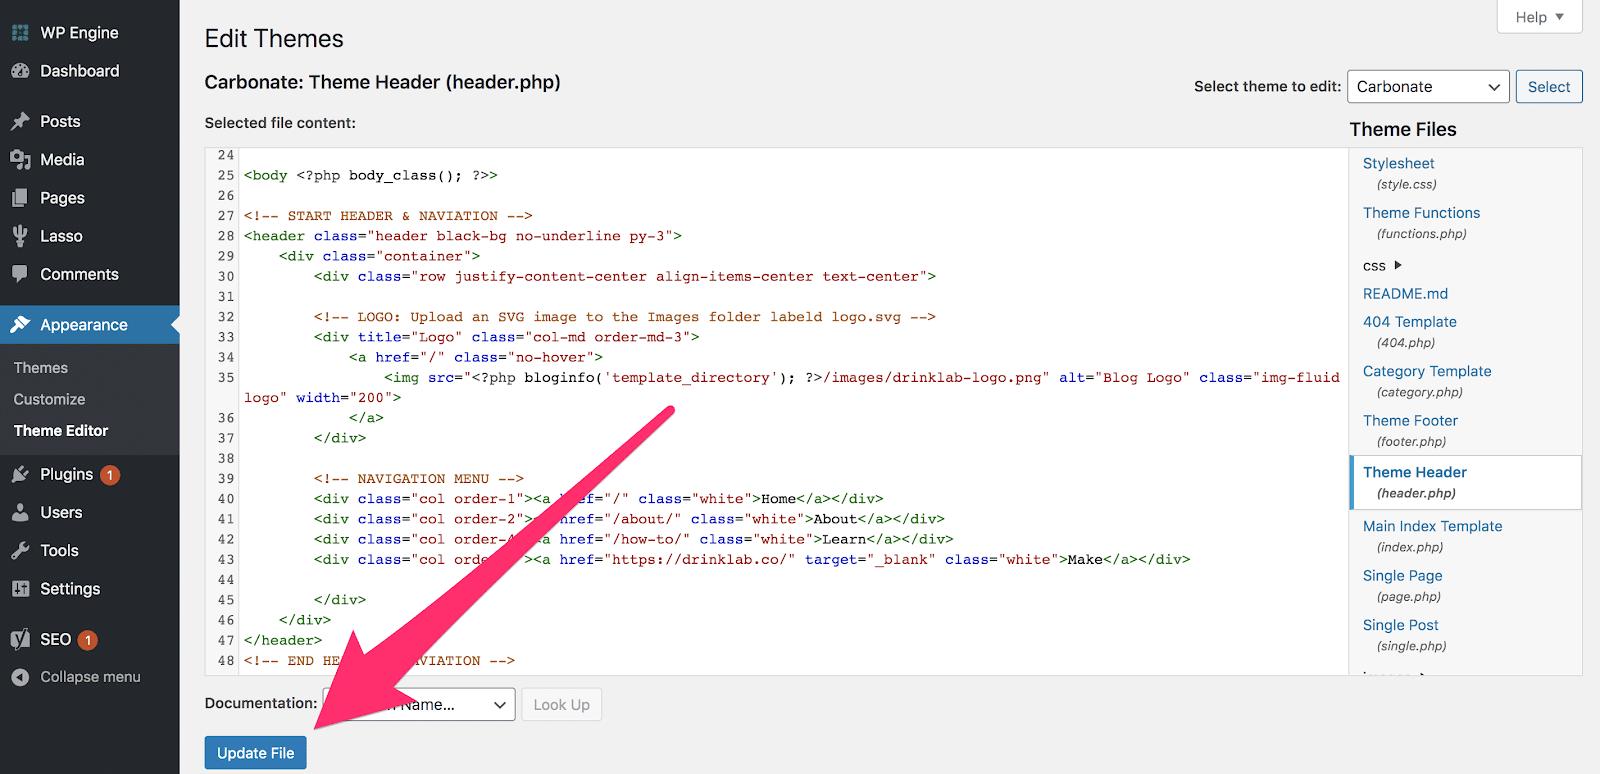 click update file in theme editor